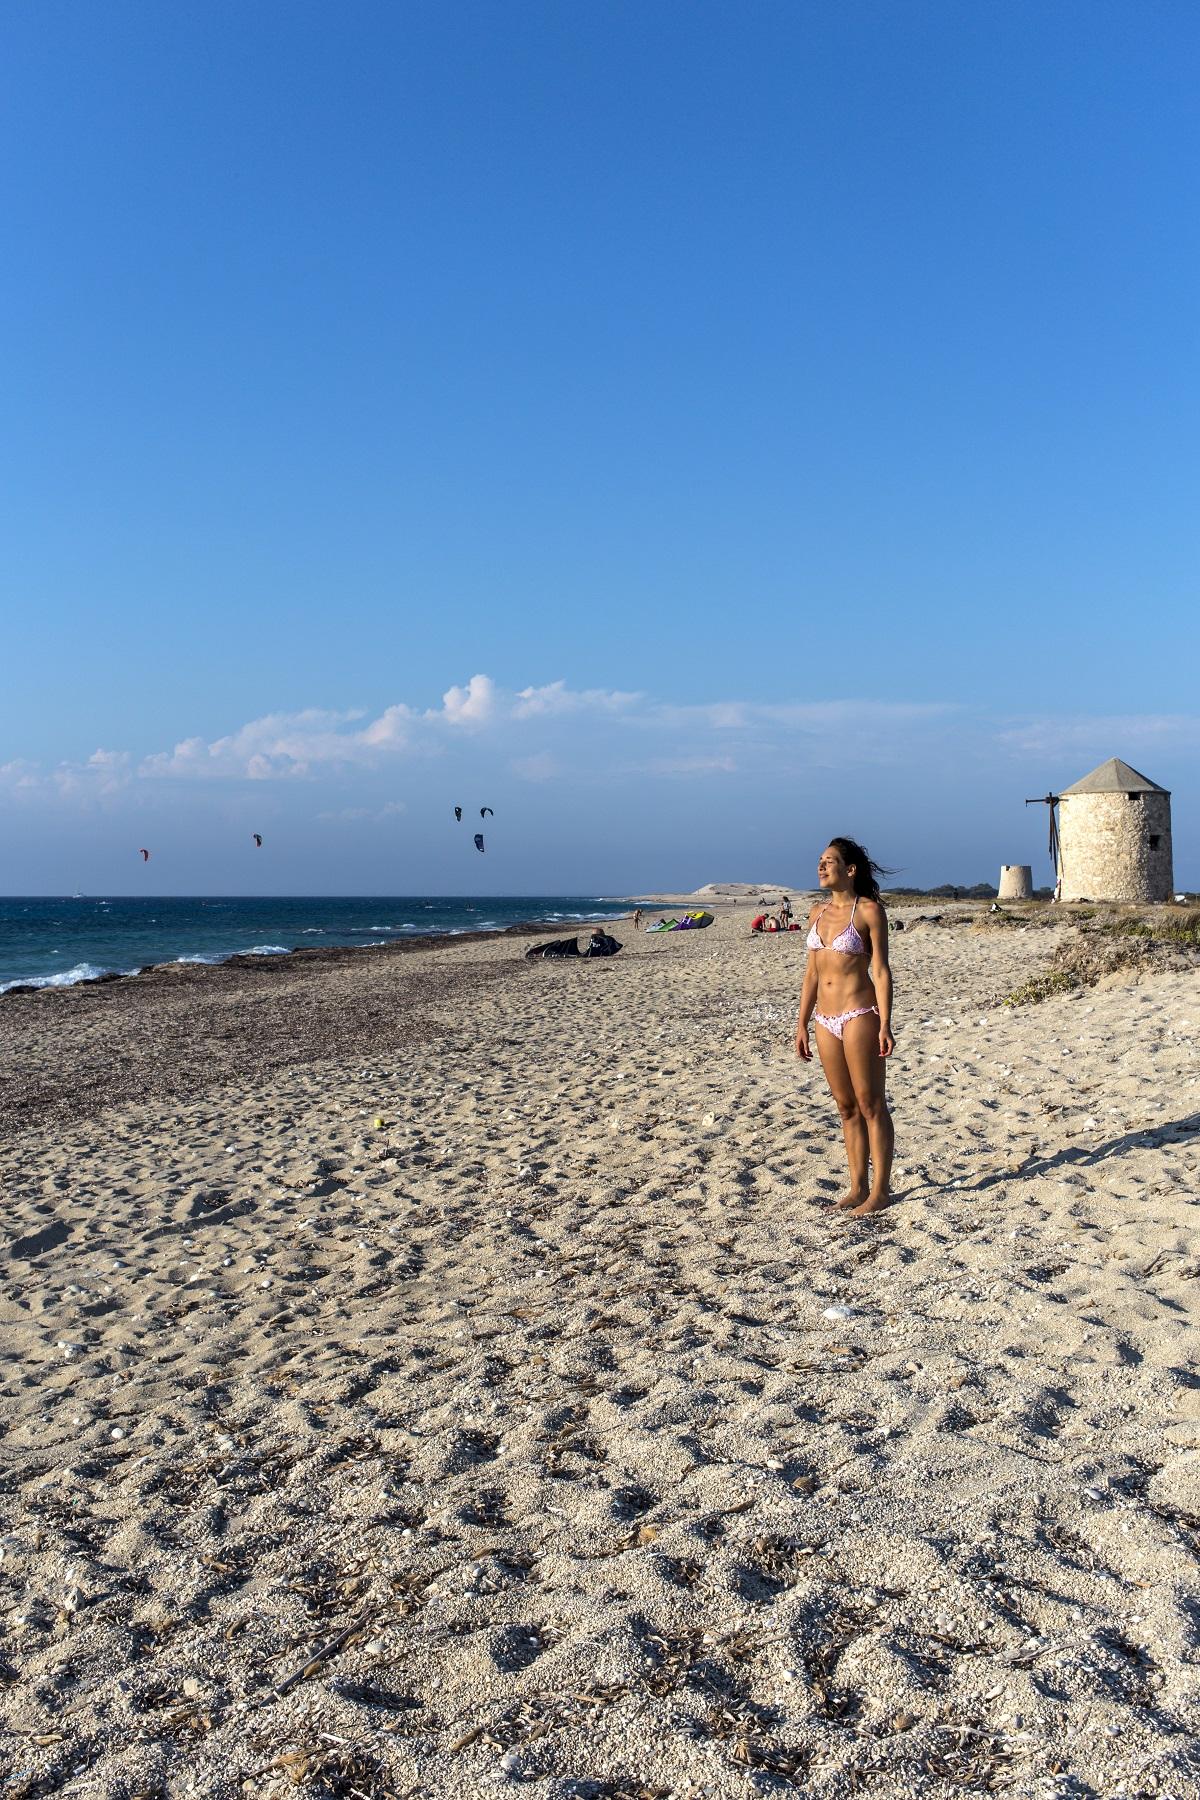 Lefkada Kite surfers paradise